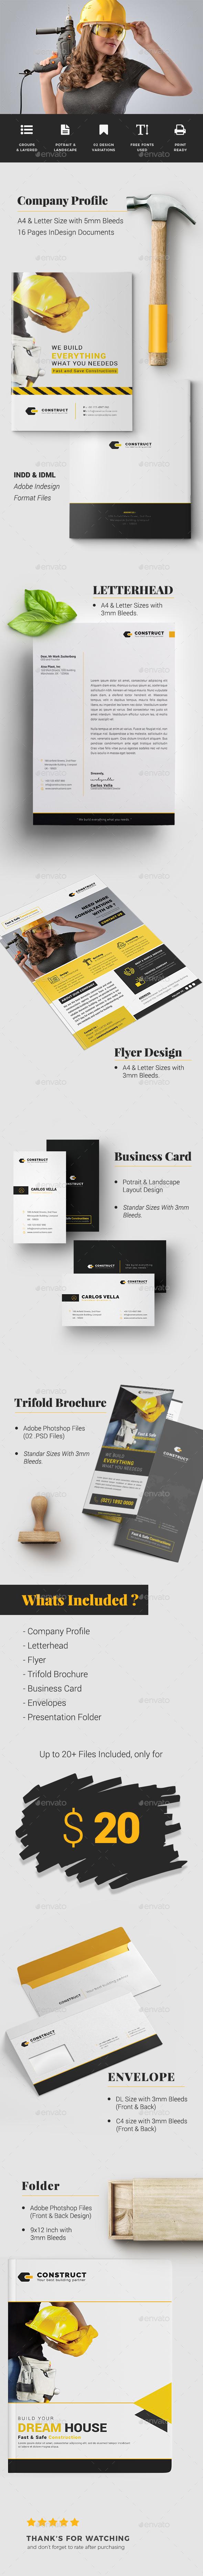 Construct Multipurpose Corporate Branding Identity - Print Templates